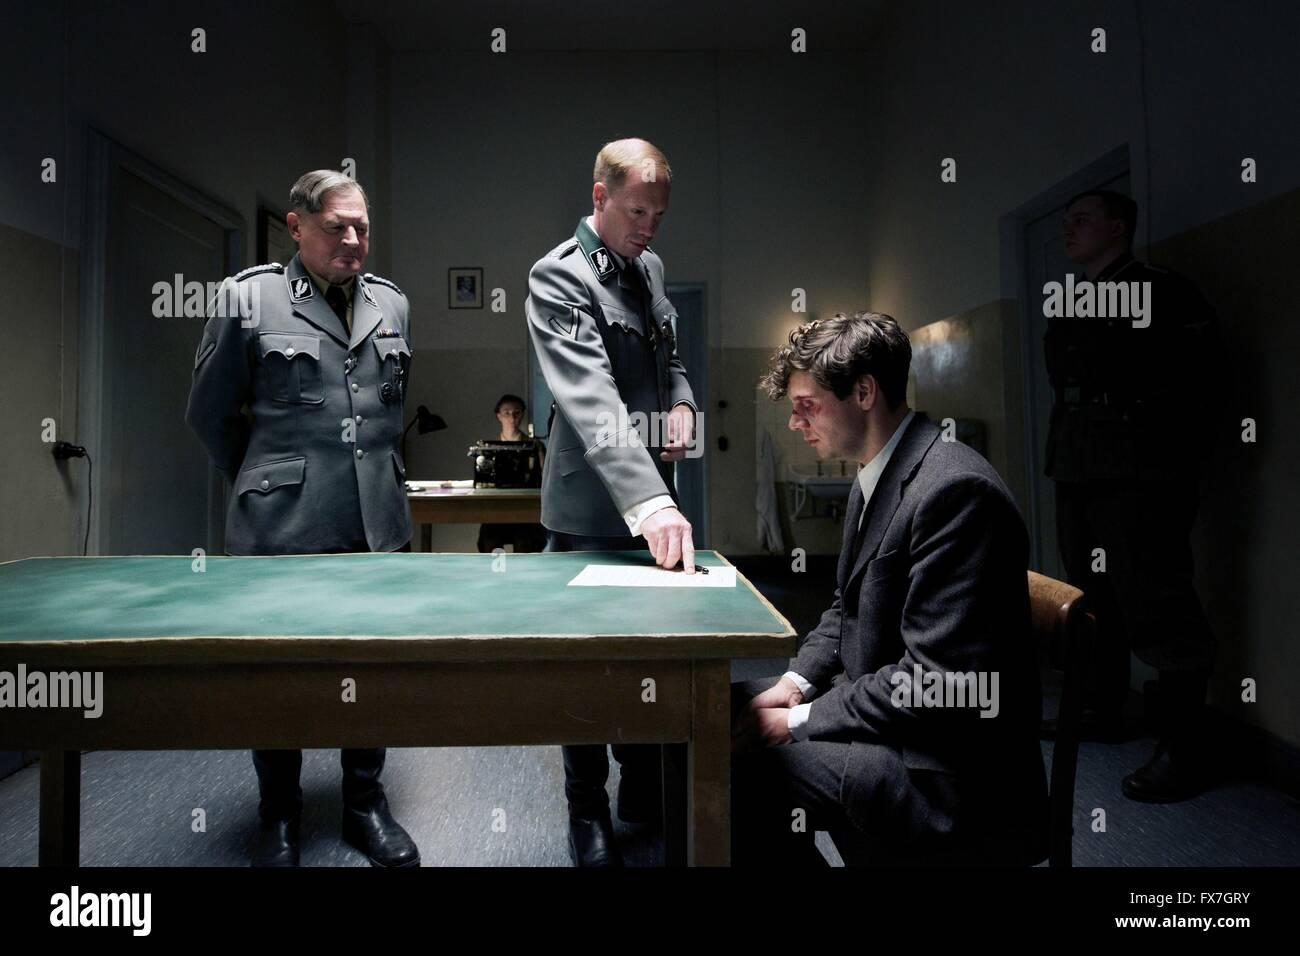 Elser Jahr: 2015 Deutschland Regie: Oliver Hirschbiegel Johann von Bülow, Burghart Klaußner, Christian Stockbild